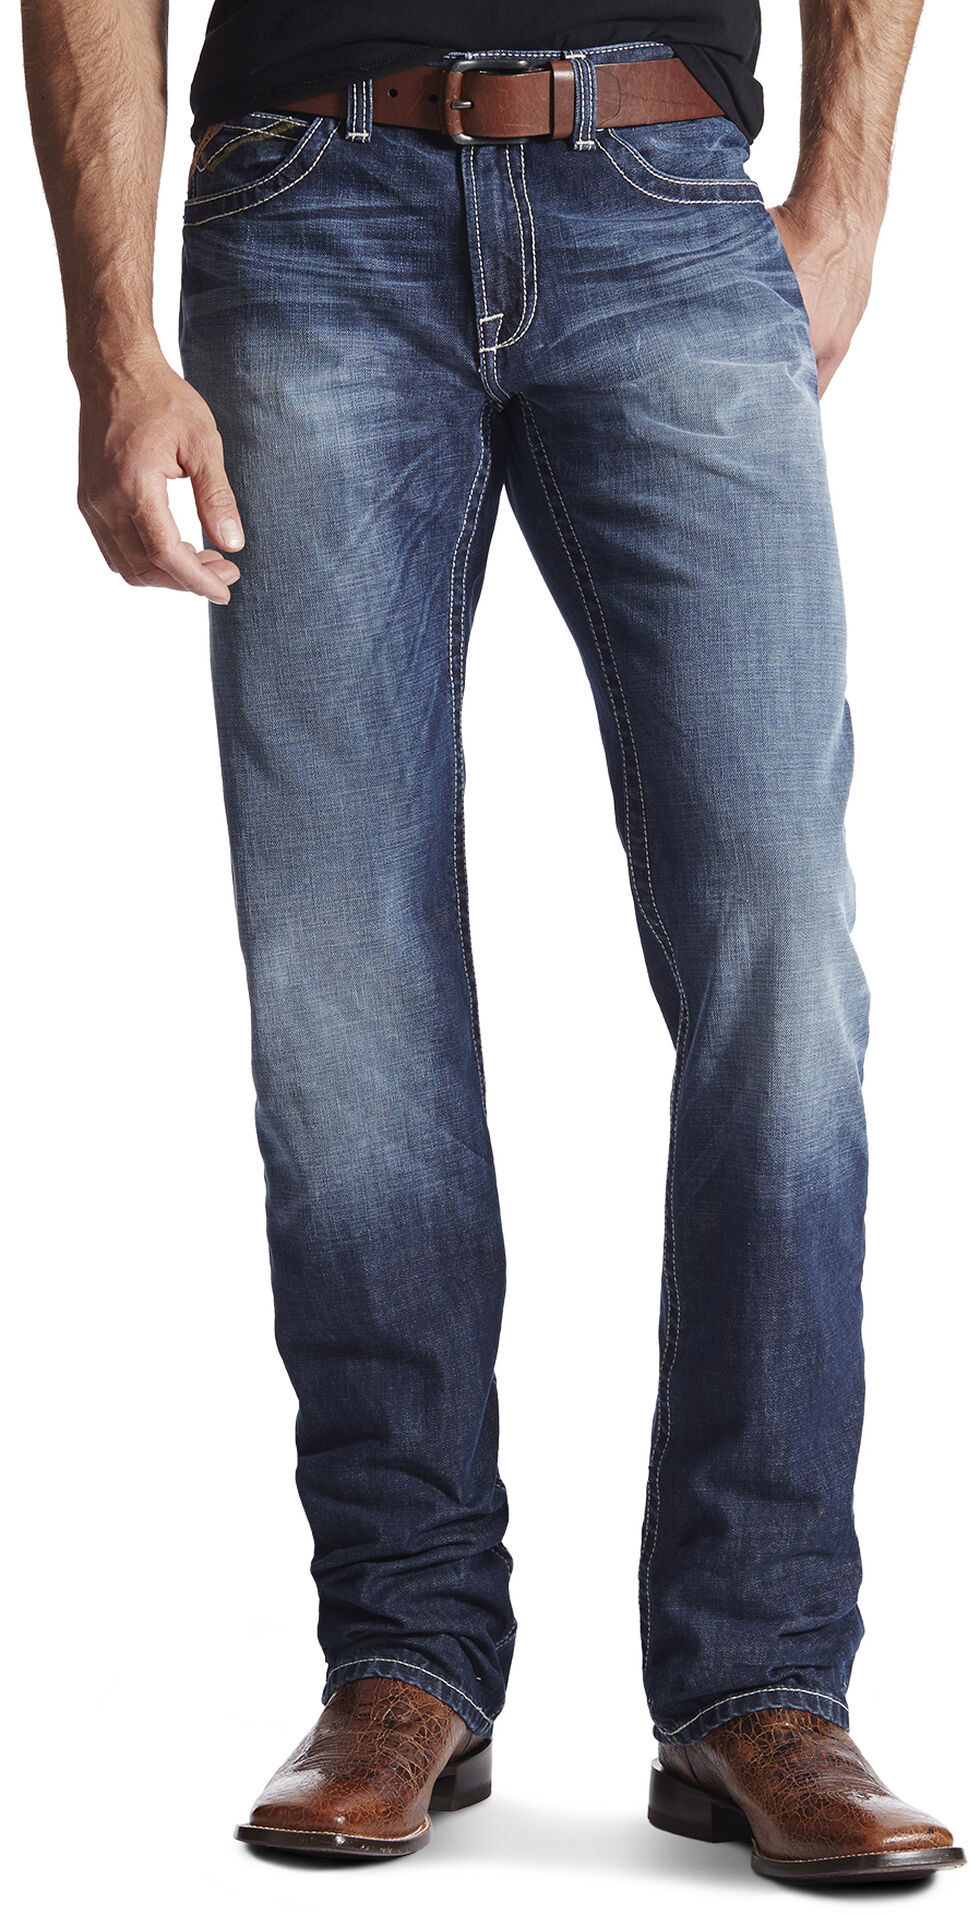 Ariat Men's M2 Strongman Cadet Bootcut Jeans, Denim, hi-res